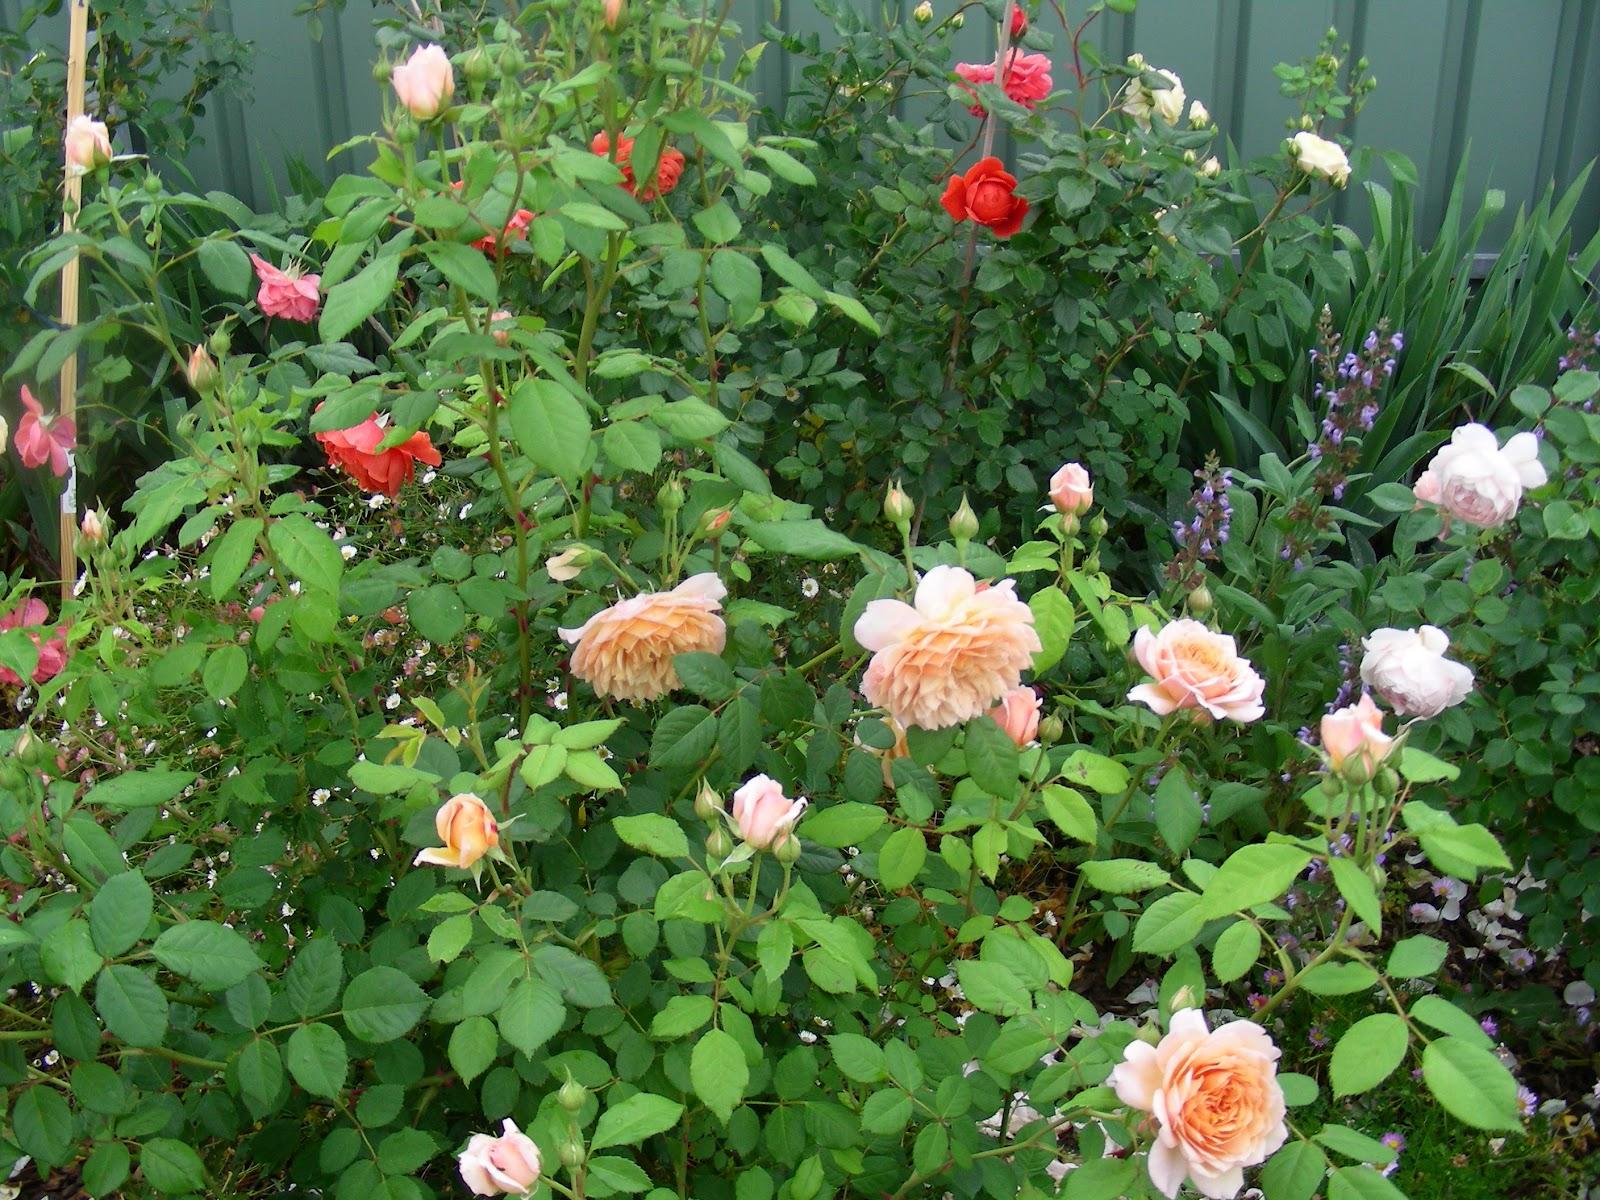 rose garden july 2012